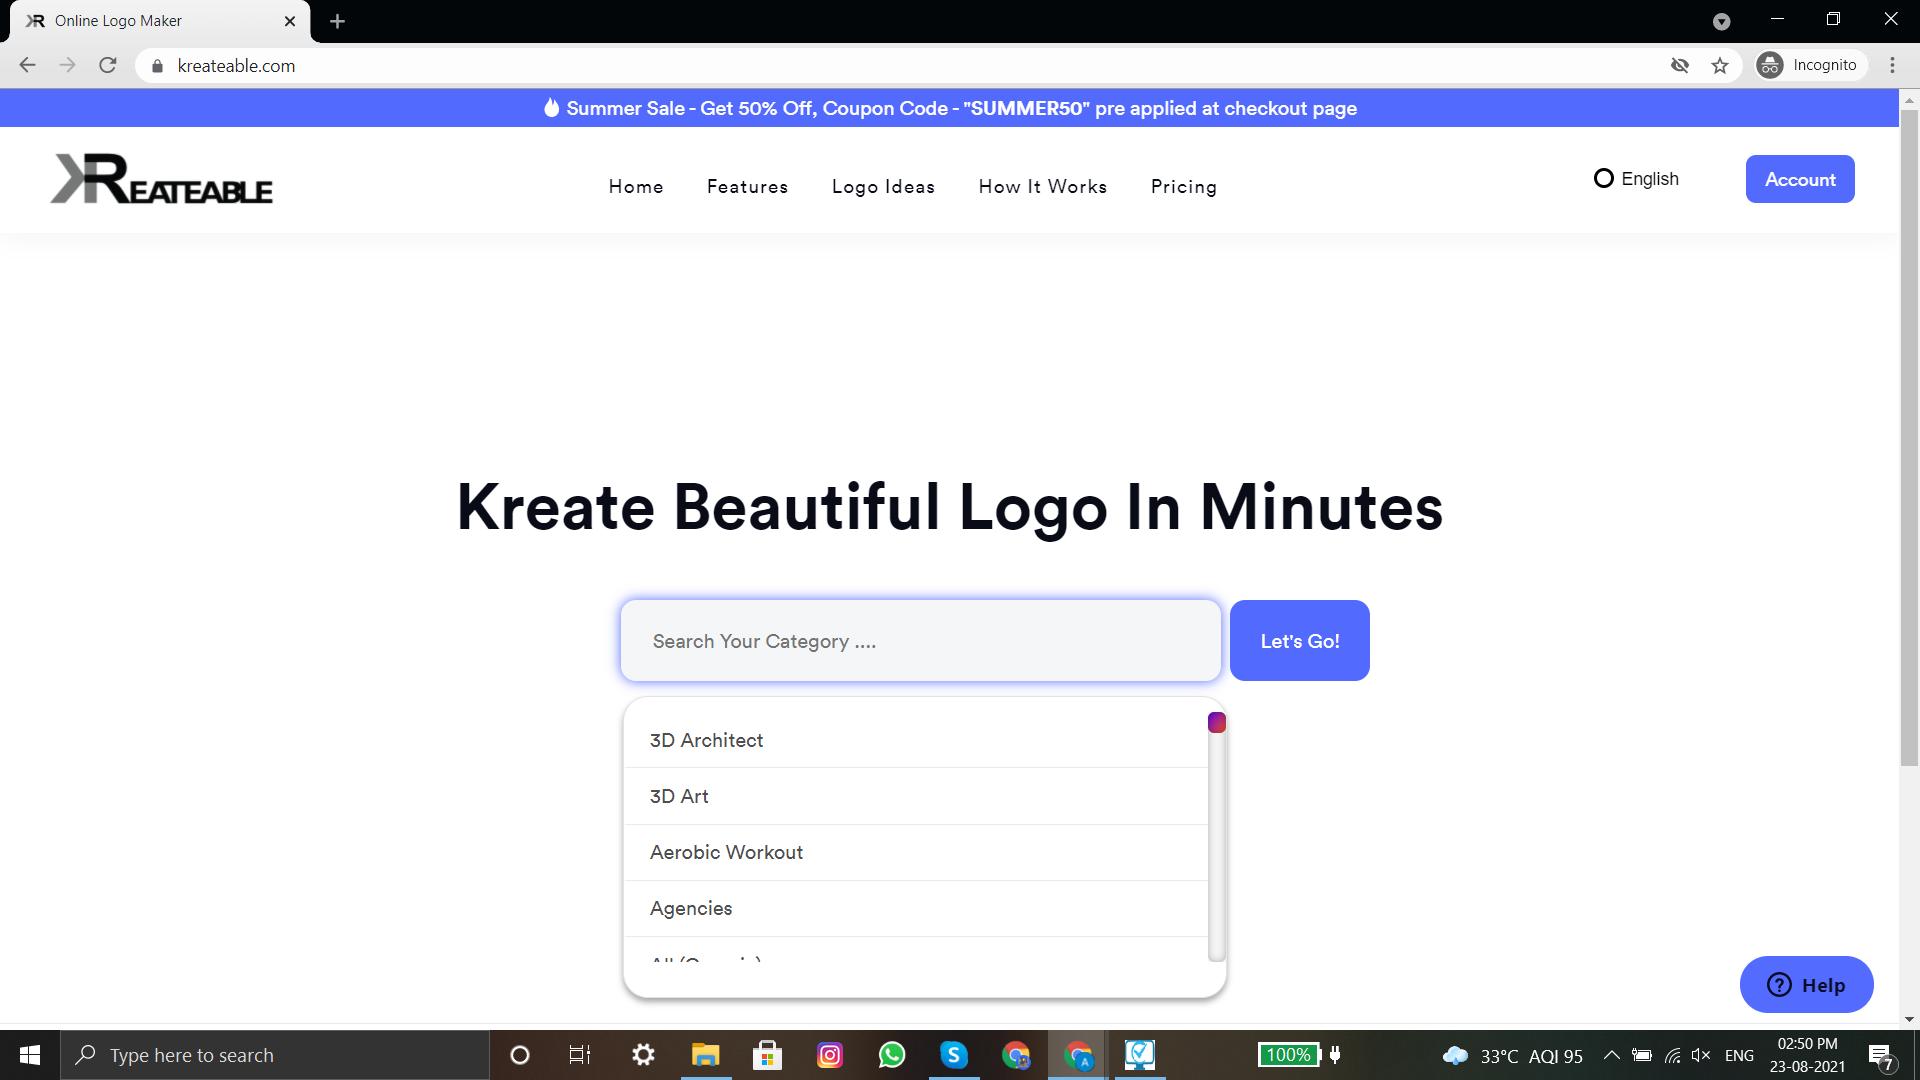 how to create a beautiful logo using kreateable